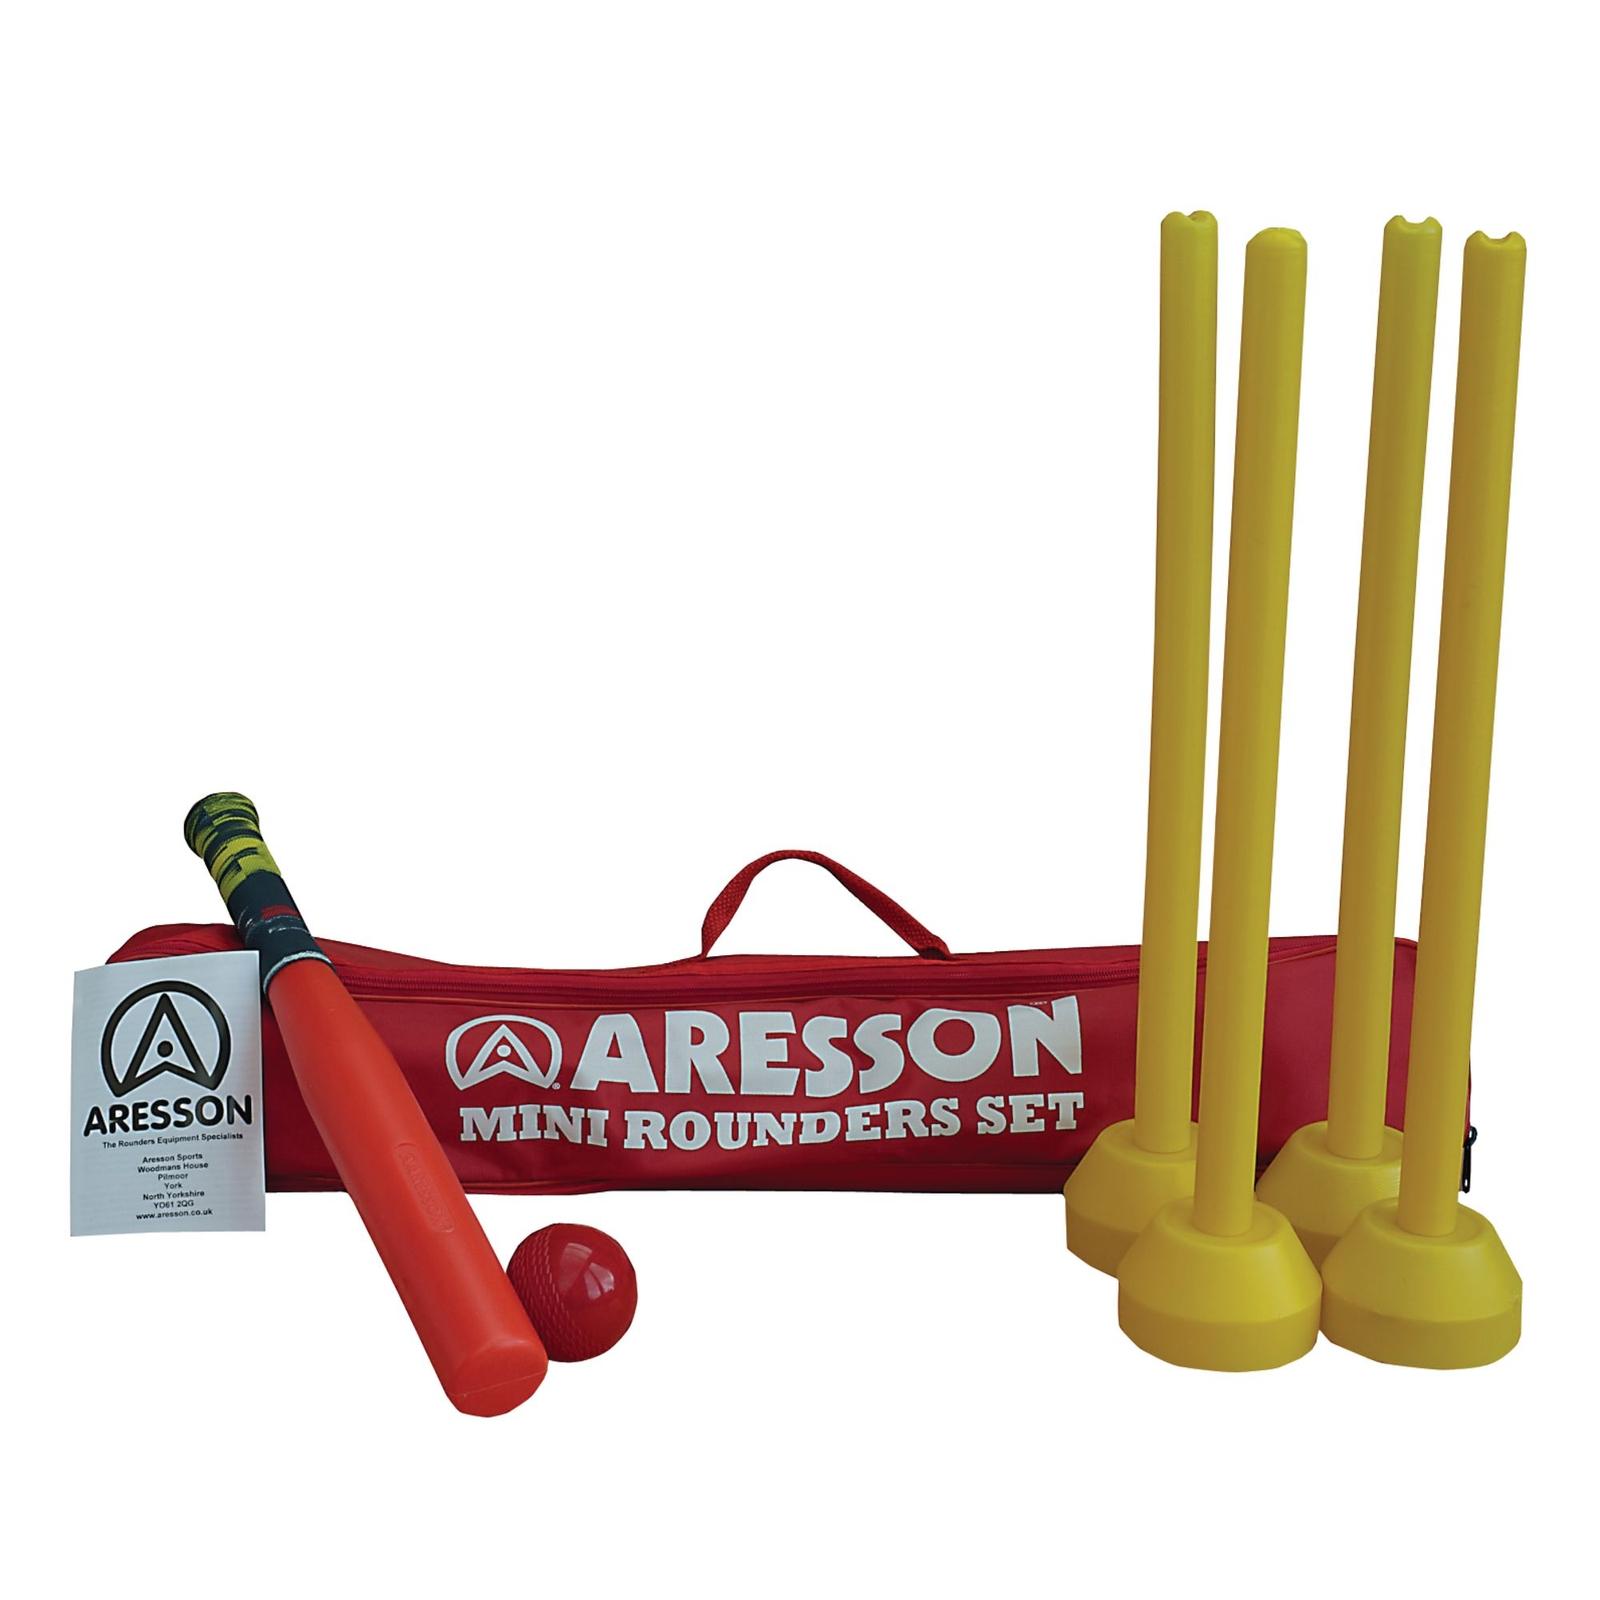 Aresson Mini Rounders Set